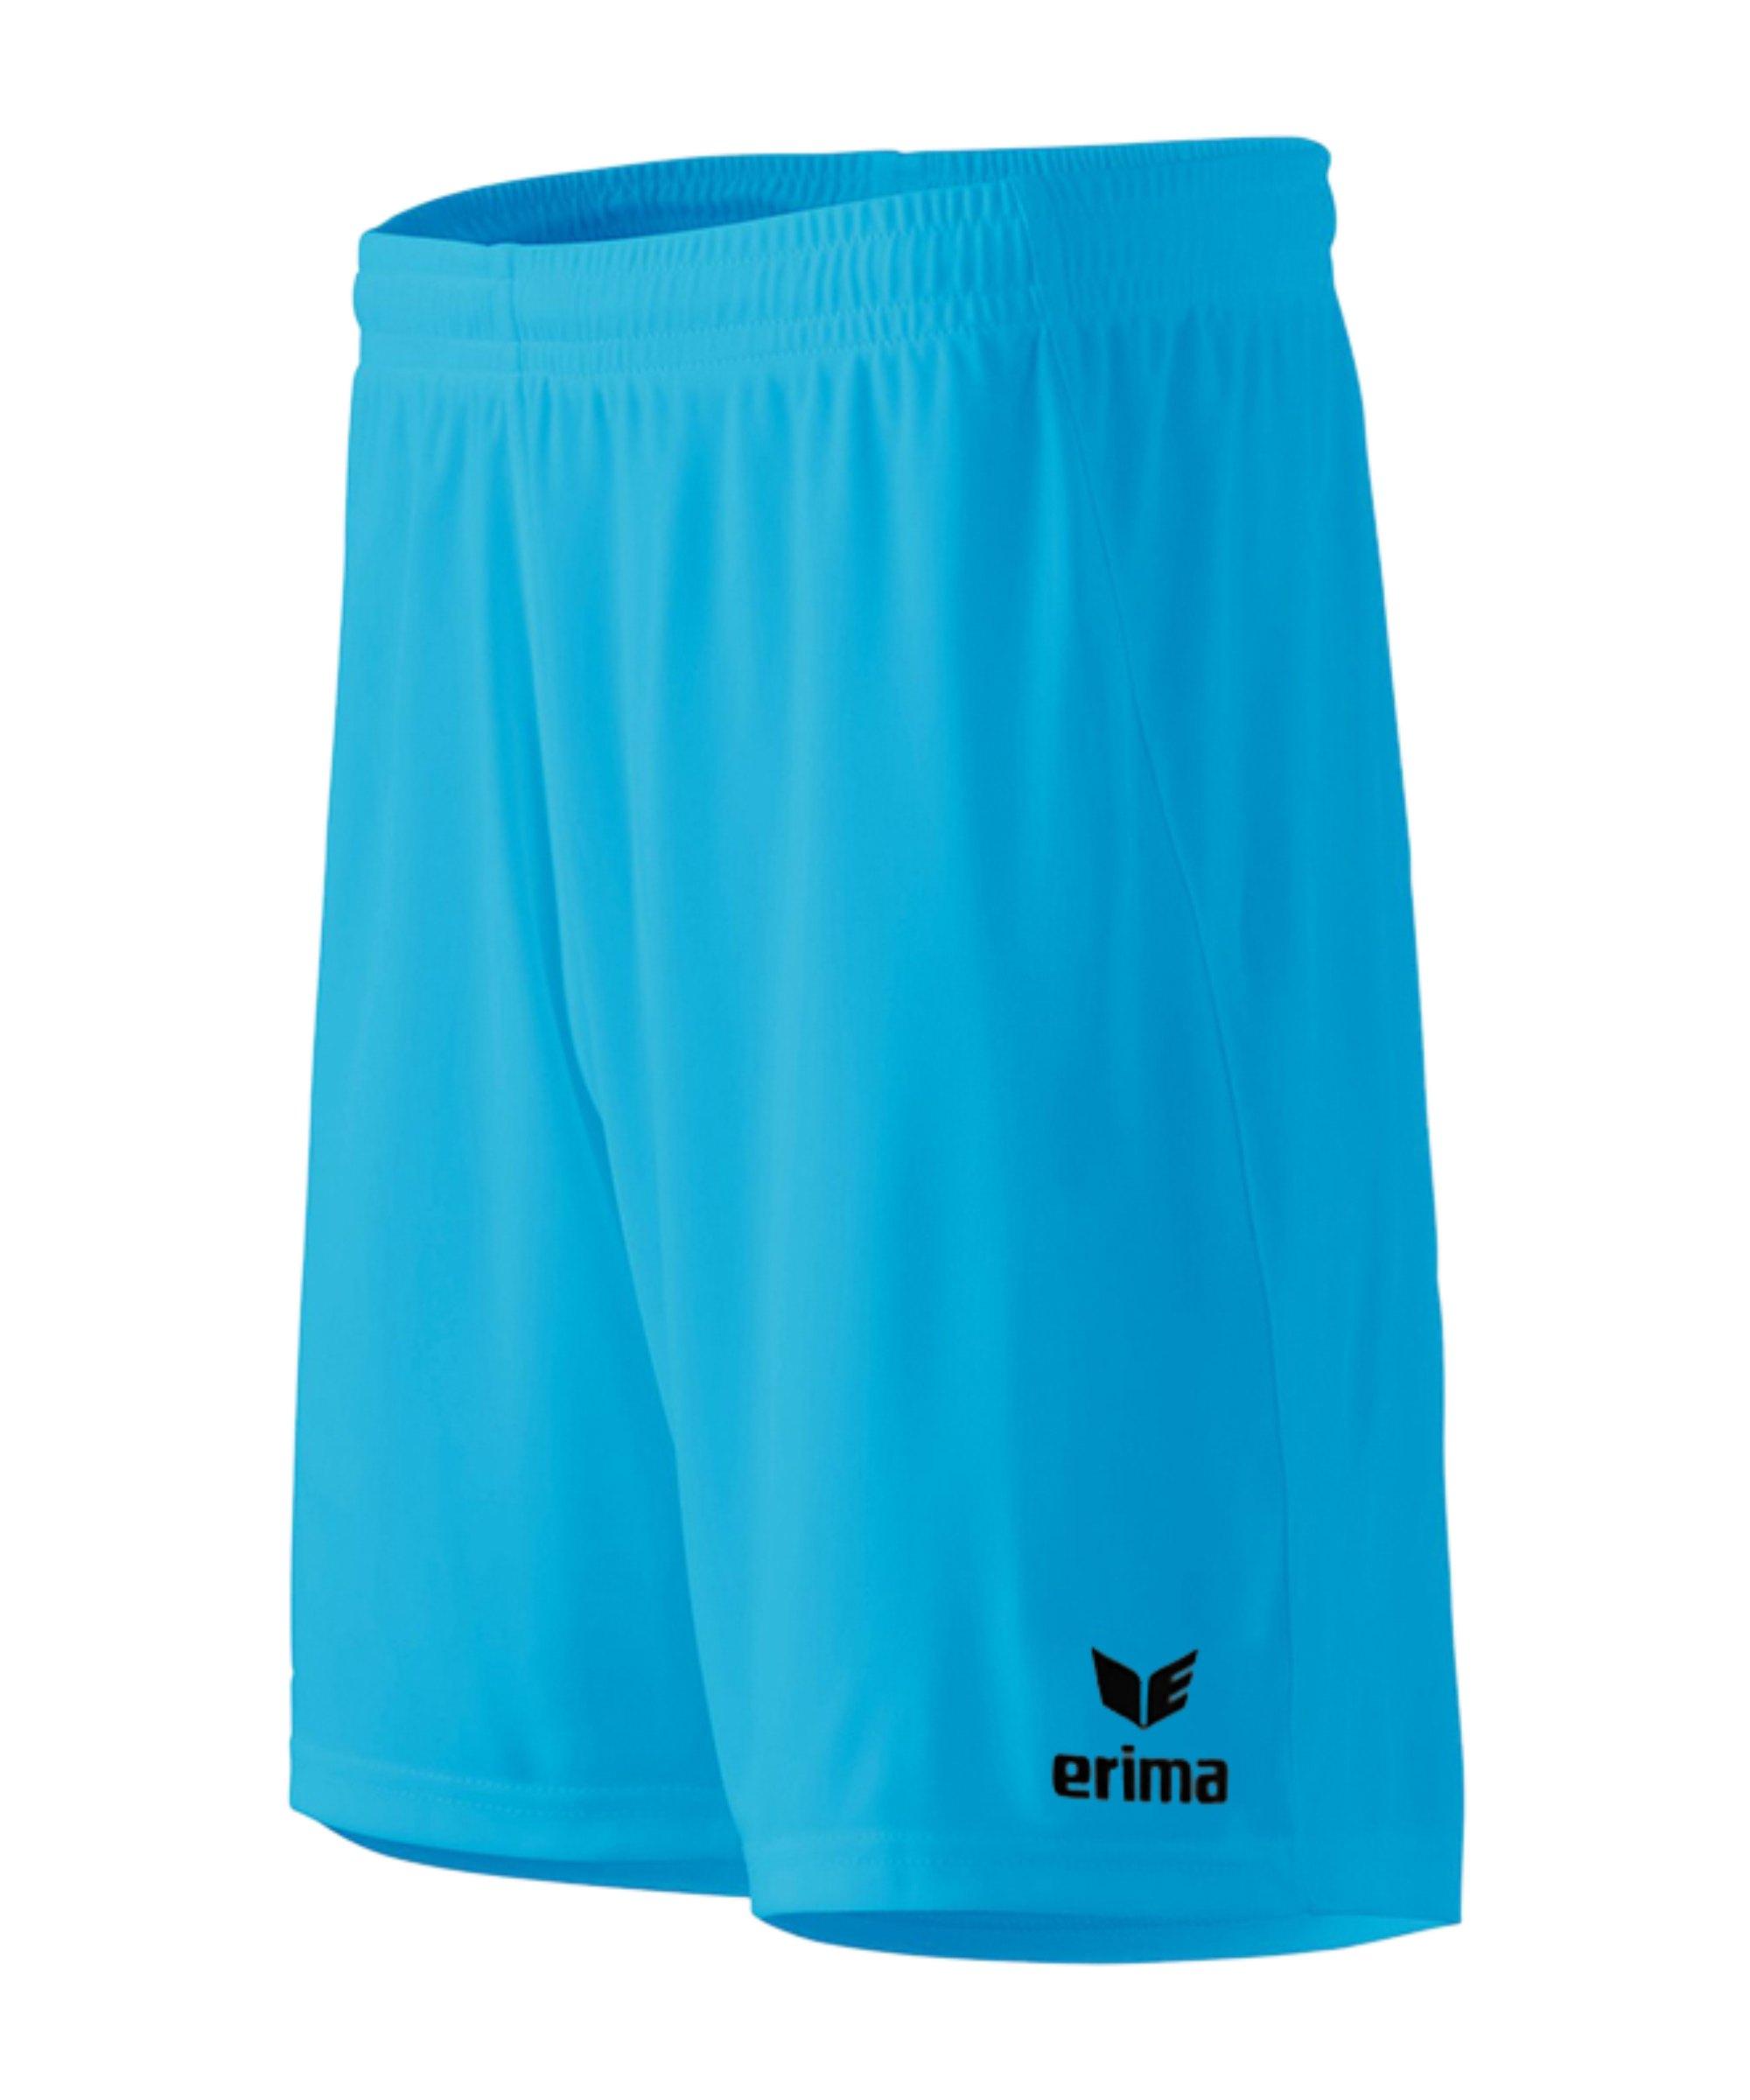 Erima Rio 2.0 Short ohne Innenslip Kids Hellblau - blau